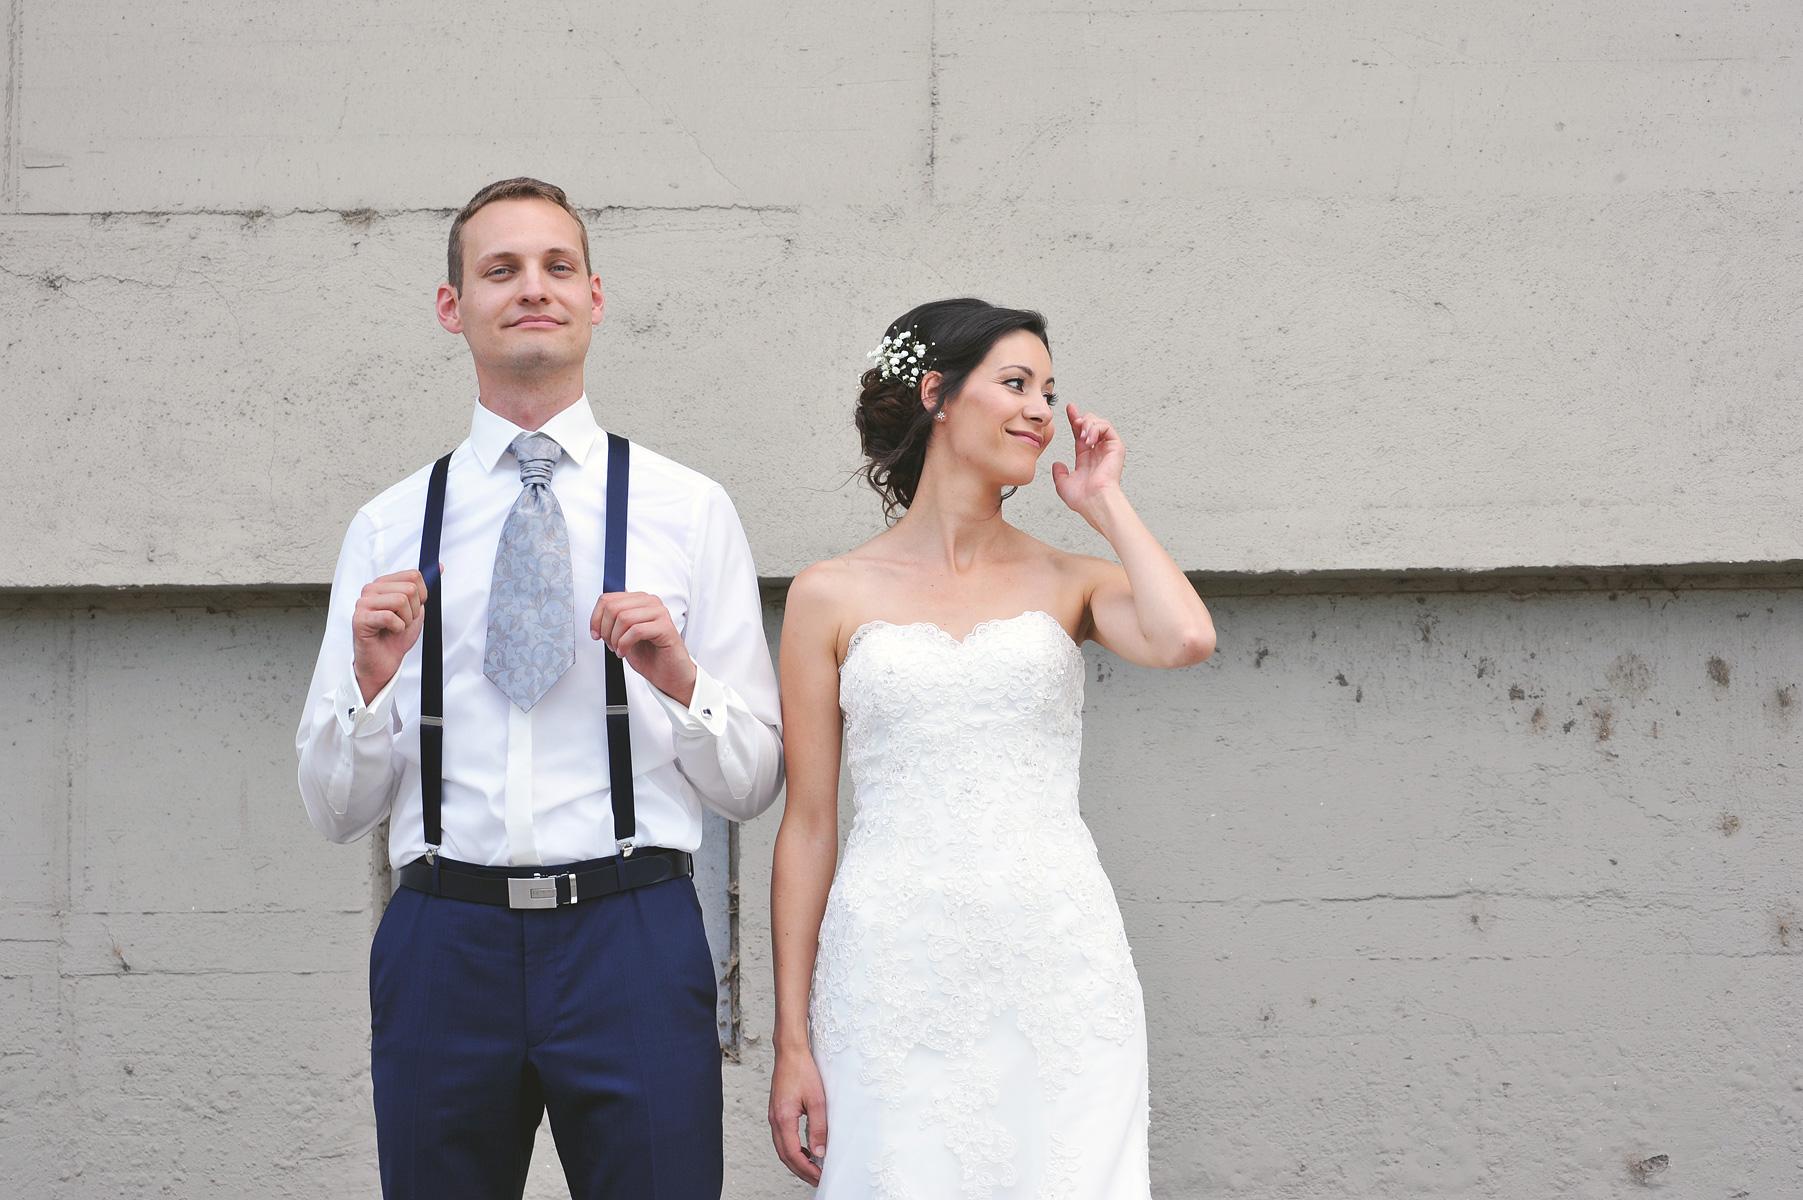 Hochzeitsfotos_nicole_bouillon_fotografie1